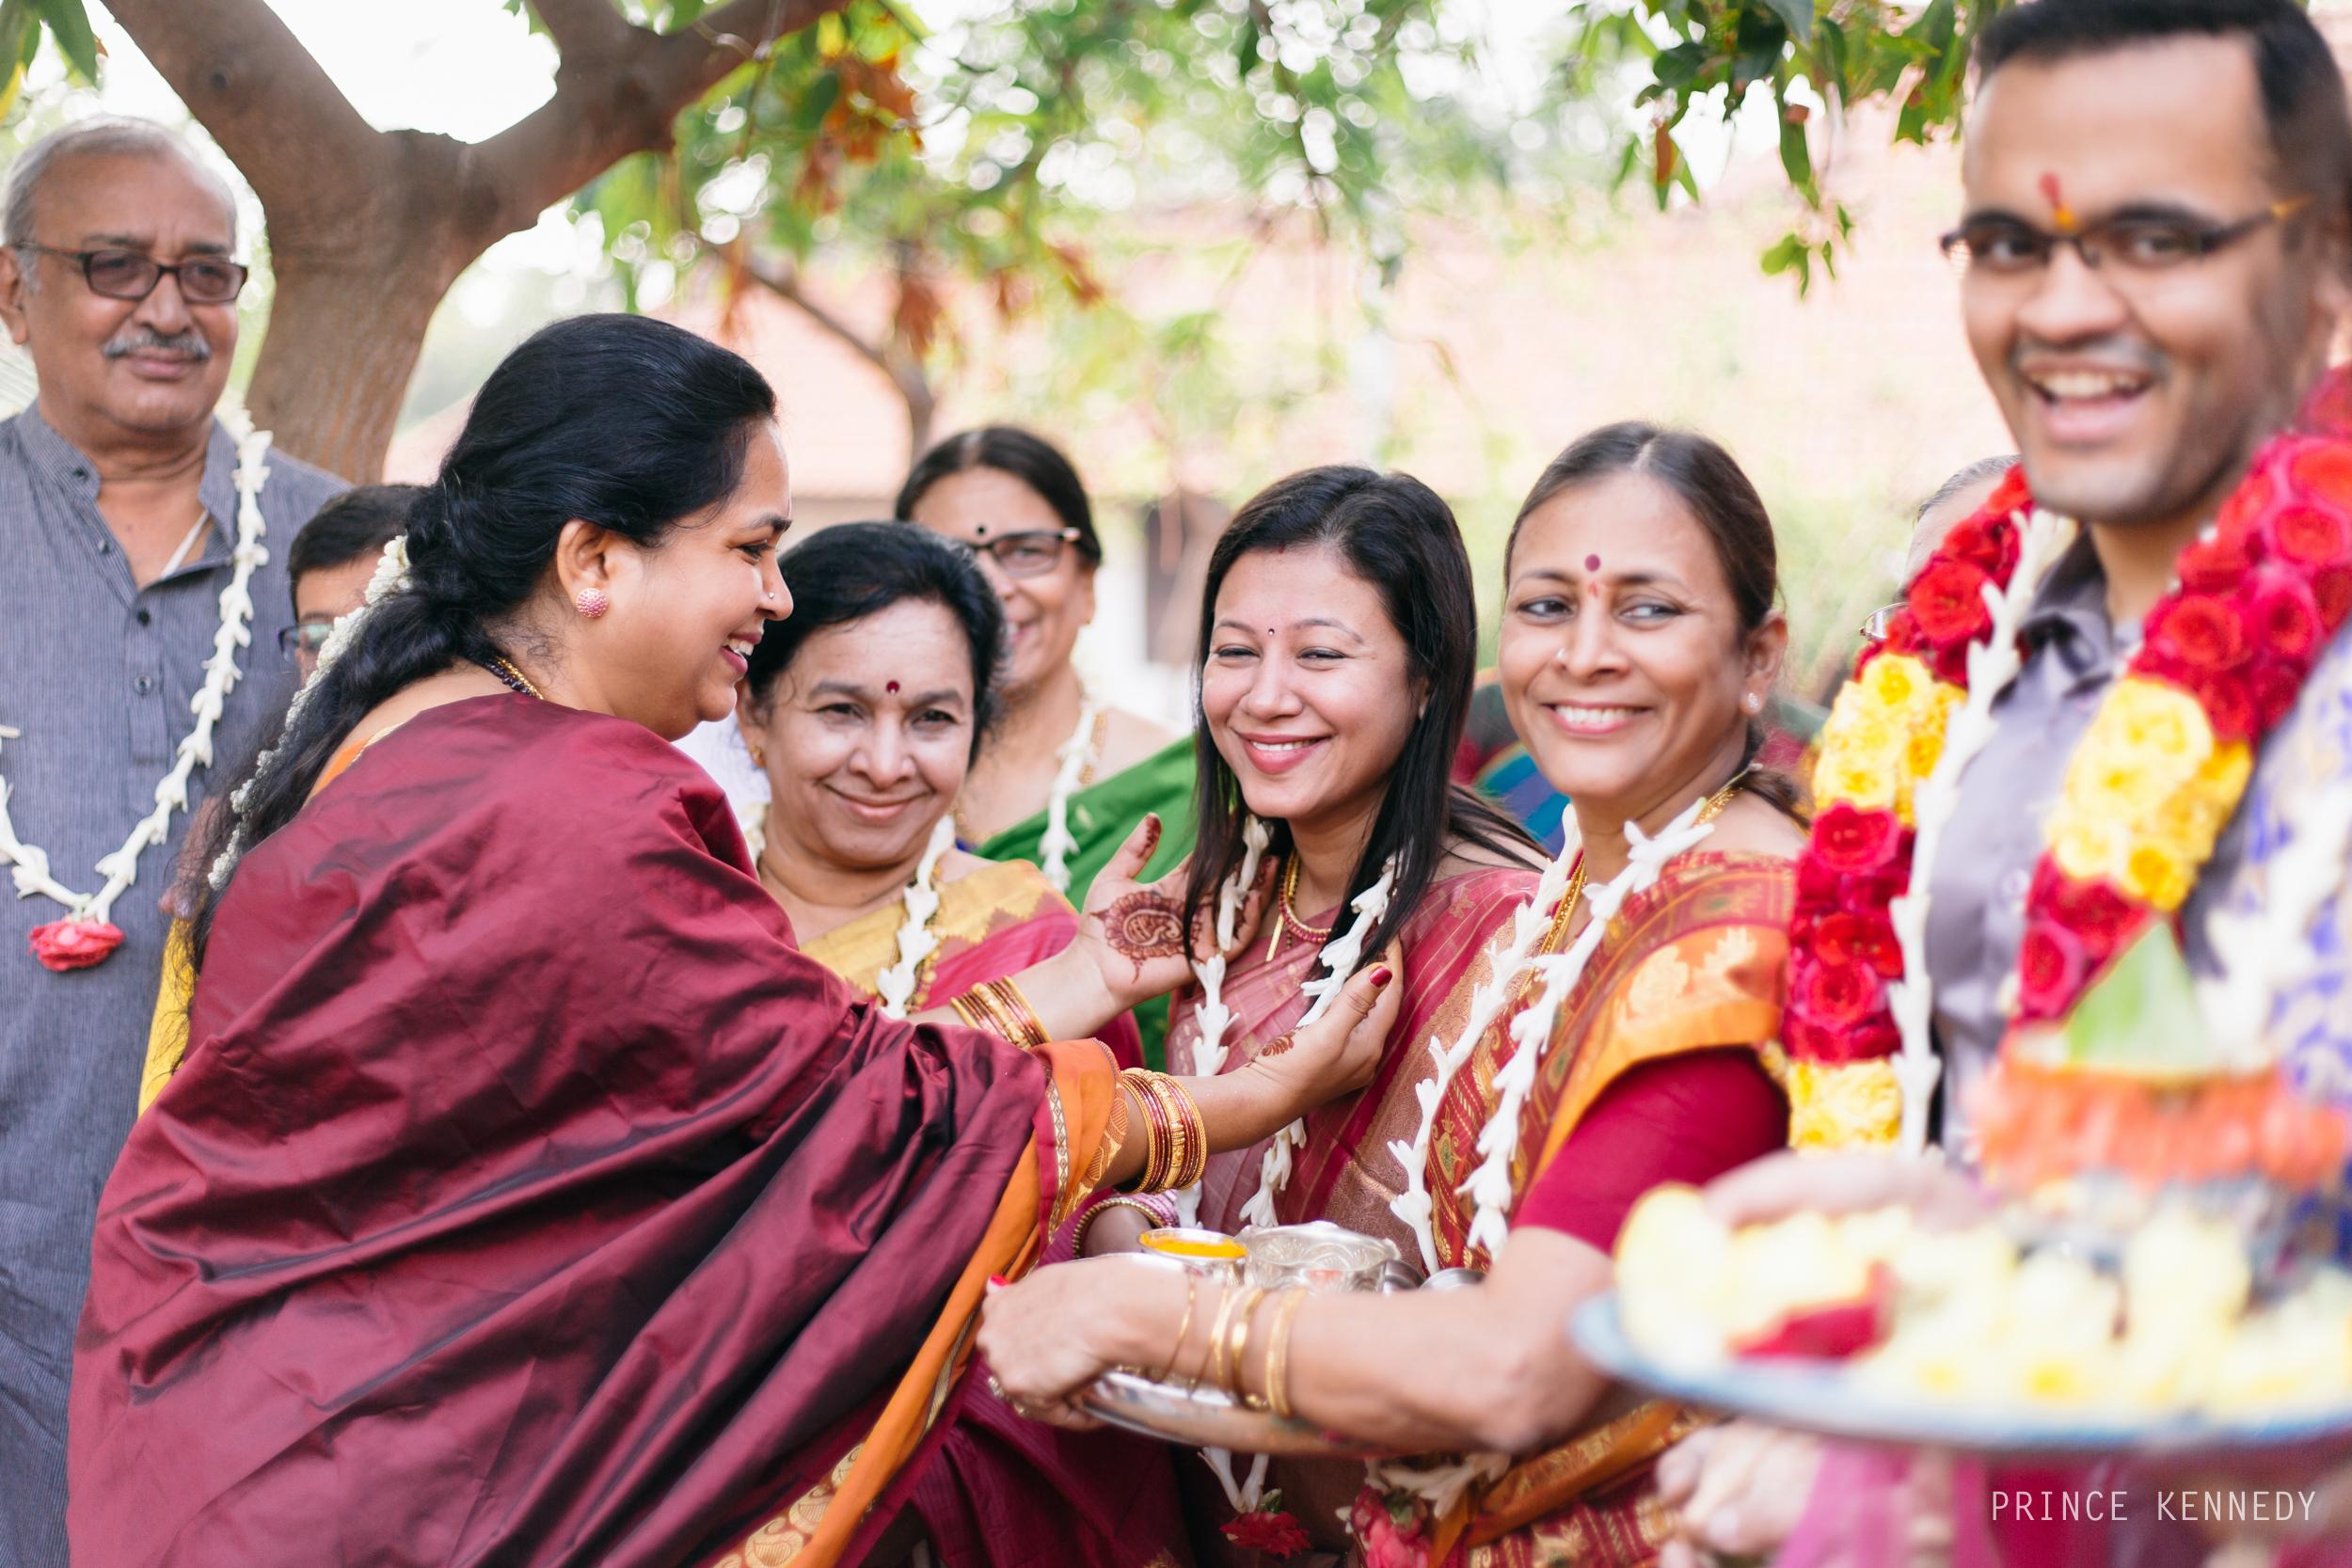 Athmajja-Nithesh-Engagement-Couple-Portrait-Portraiture-Wedding-Couple-Portrait-Chennai-Photographer-Candid-Photography-Destination-Best-Prince-Kennedy-Photography-86.jpg